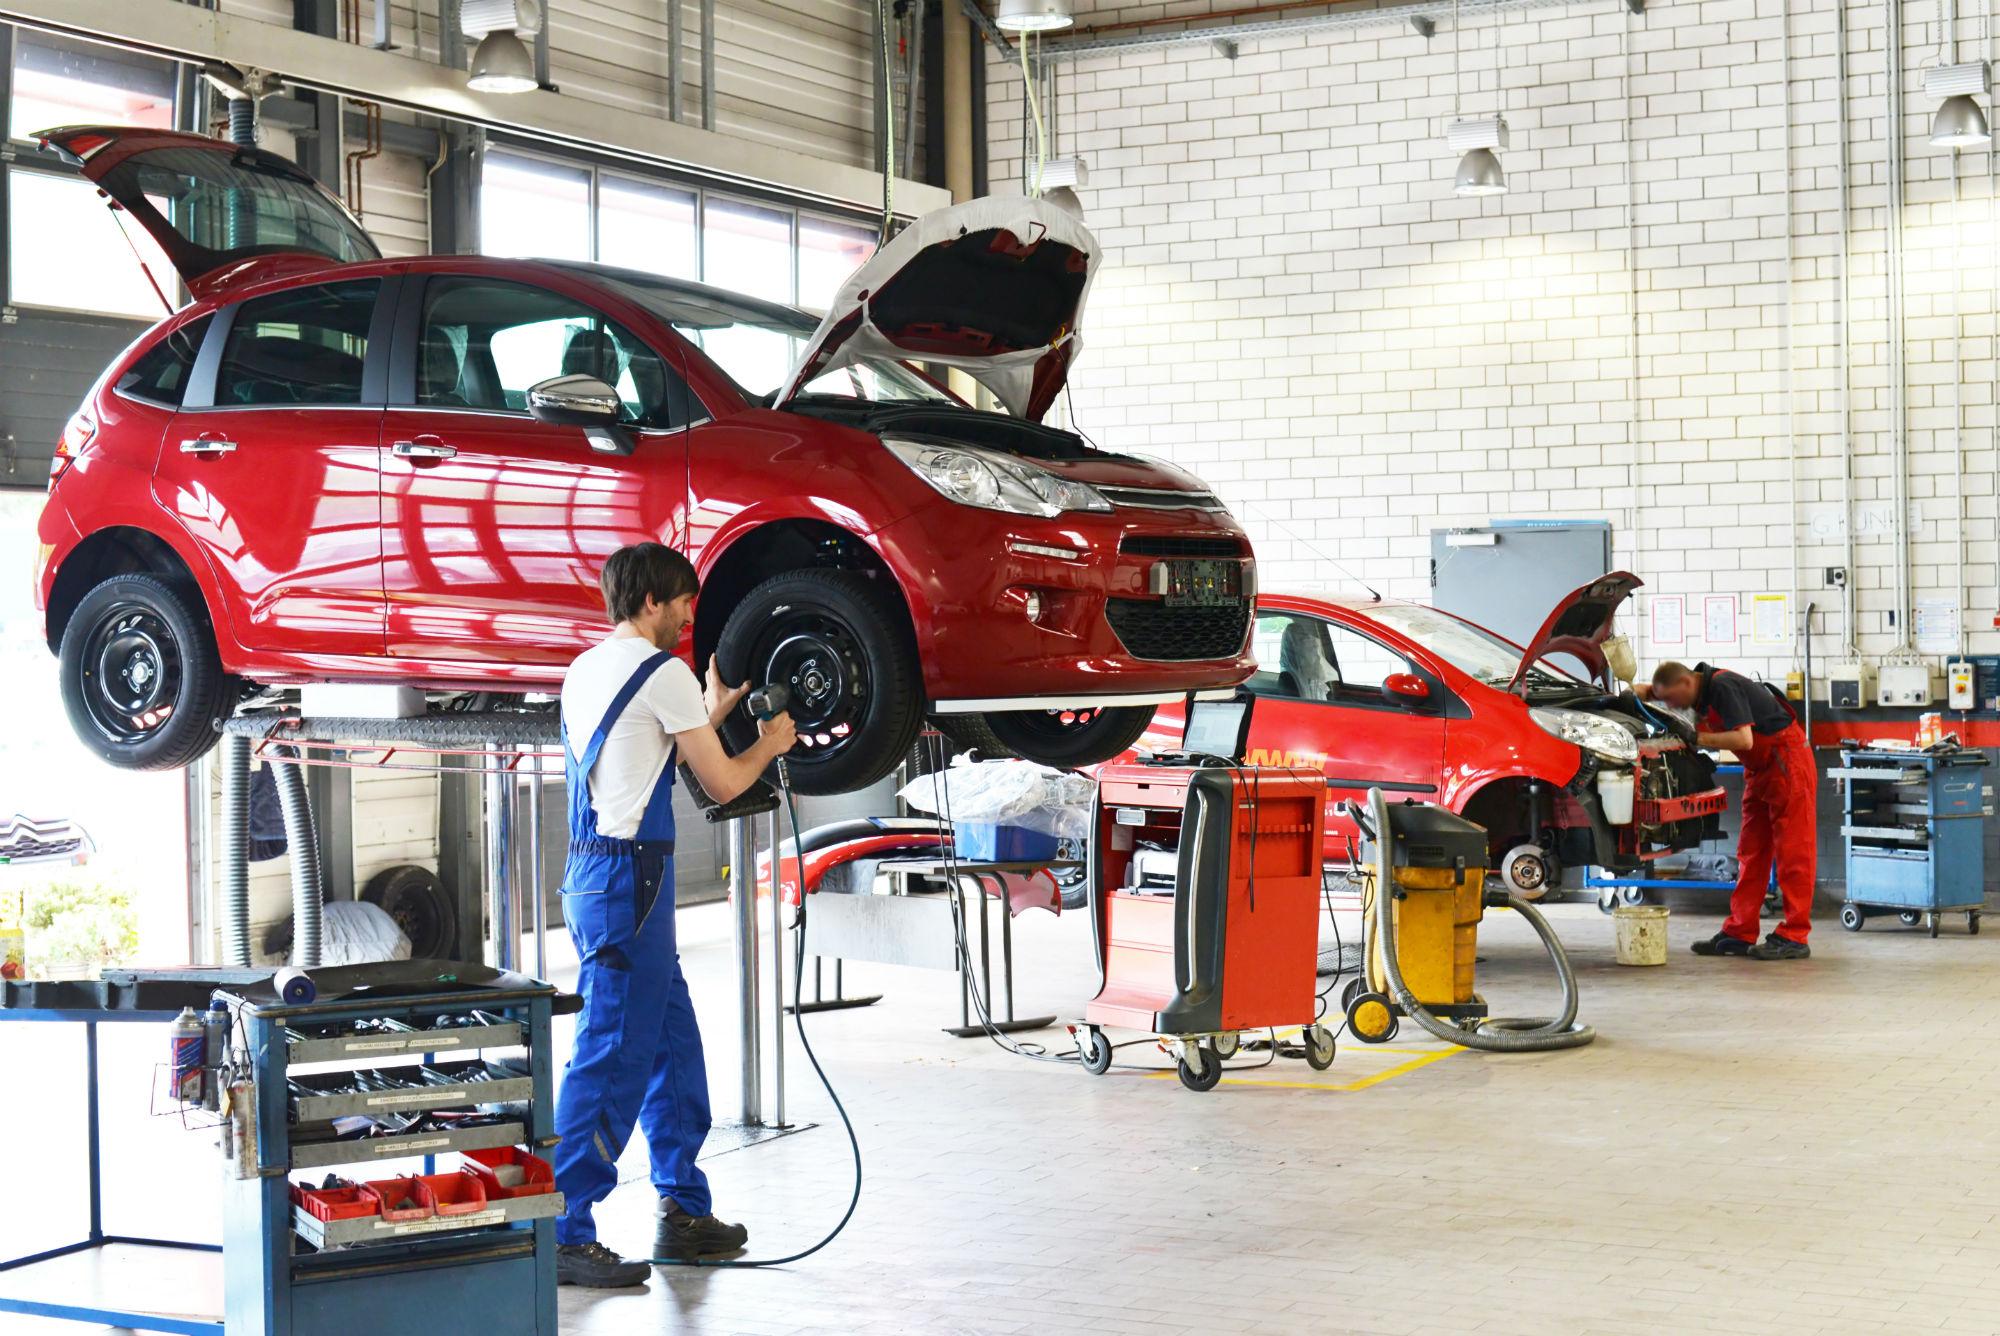 Hasil gambar untuk Professional Auto Repair Advice